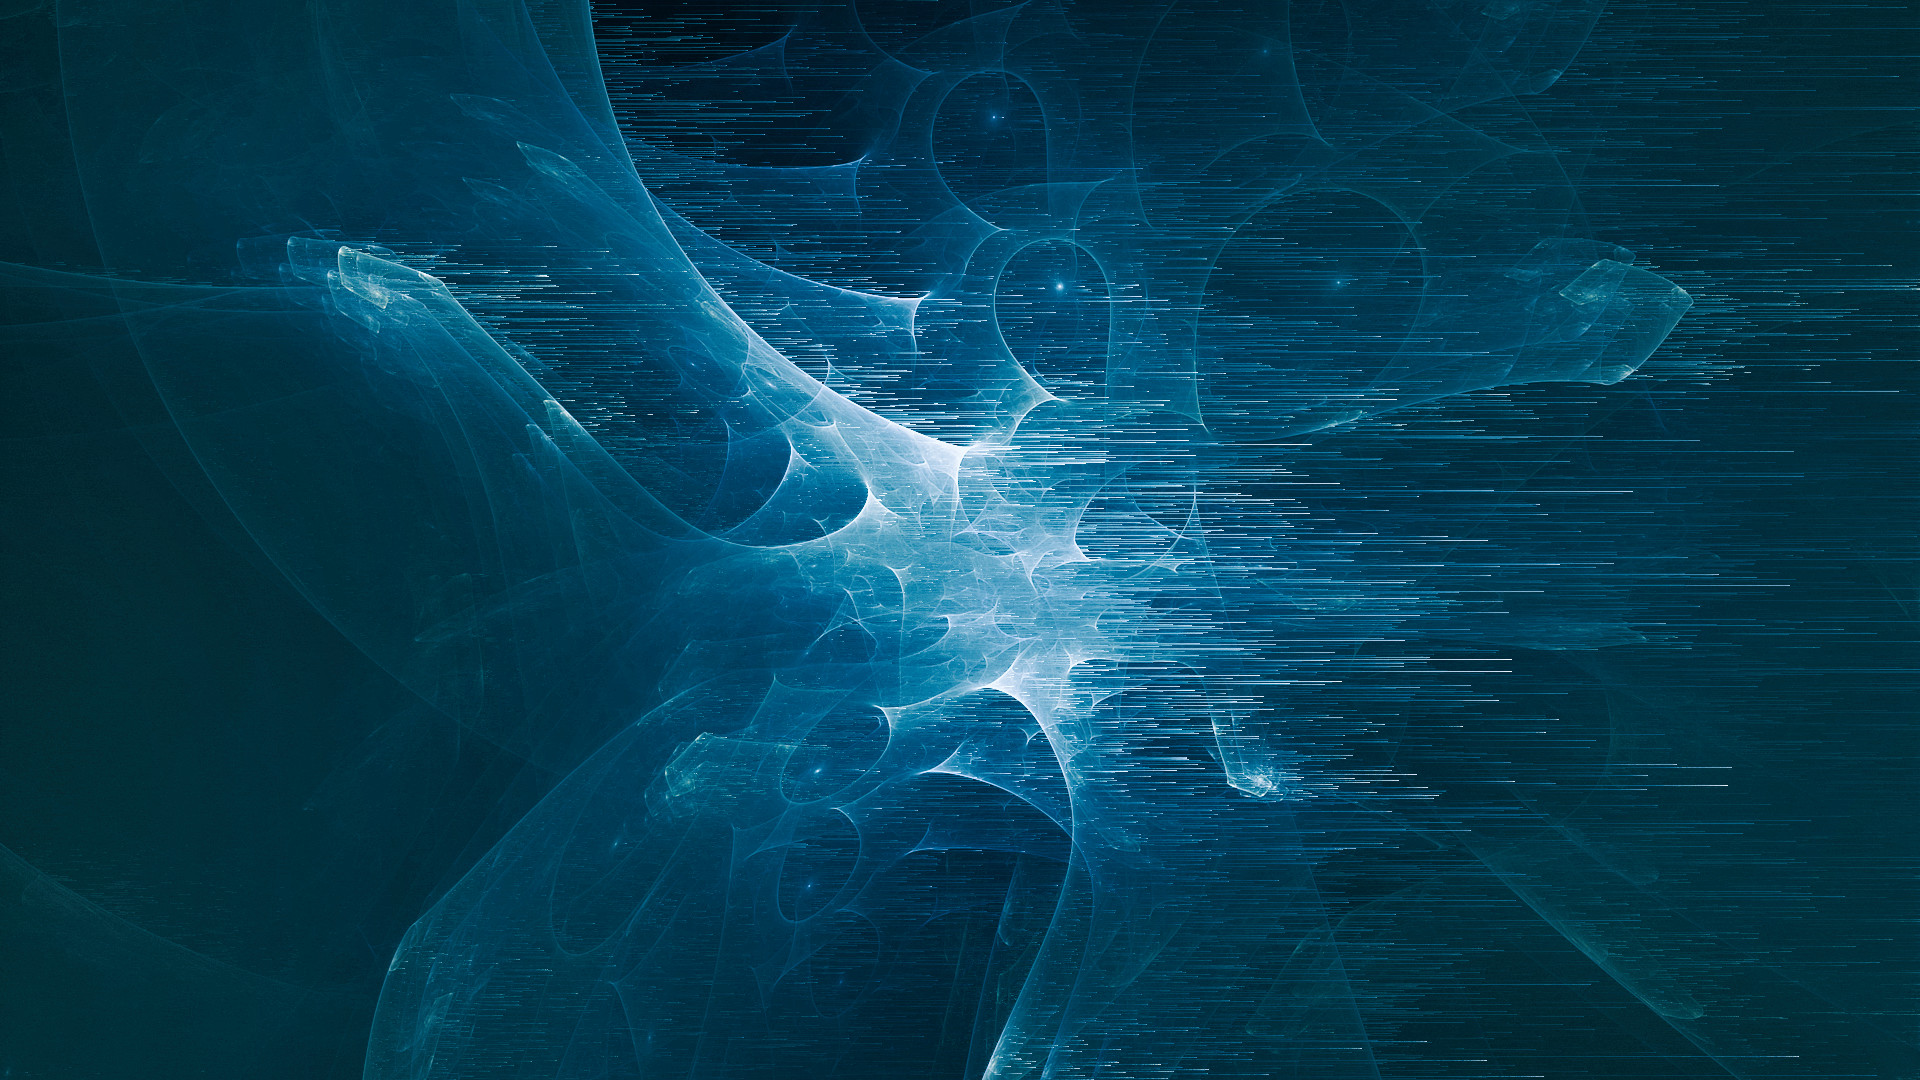 Kresimir jelusic robob3ar fractal rain 0